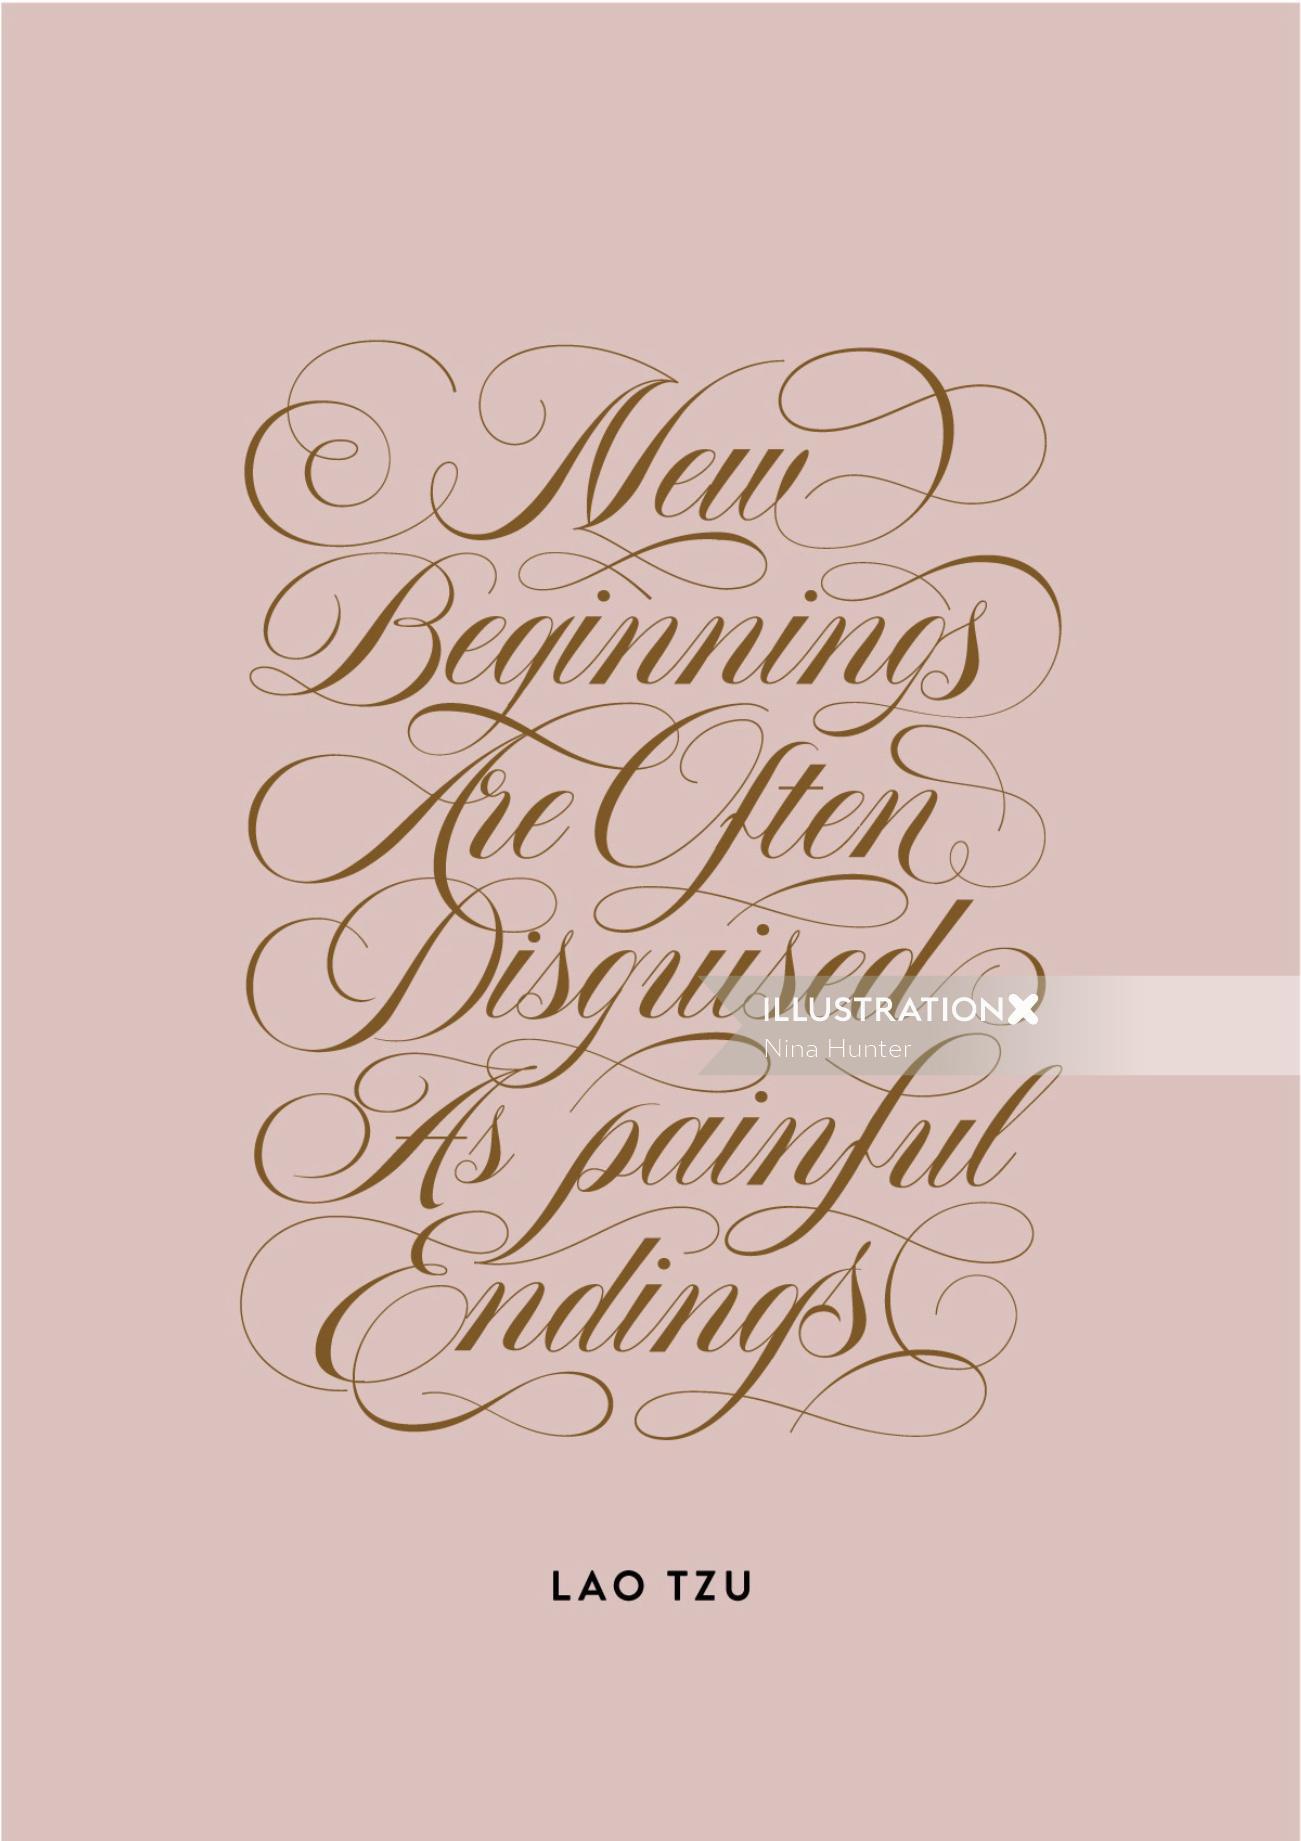 Calligraphy art of New Beginnings